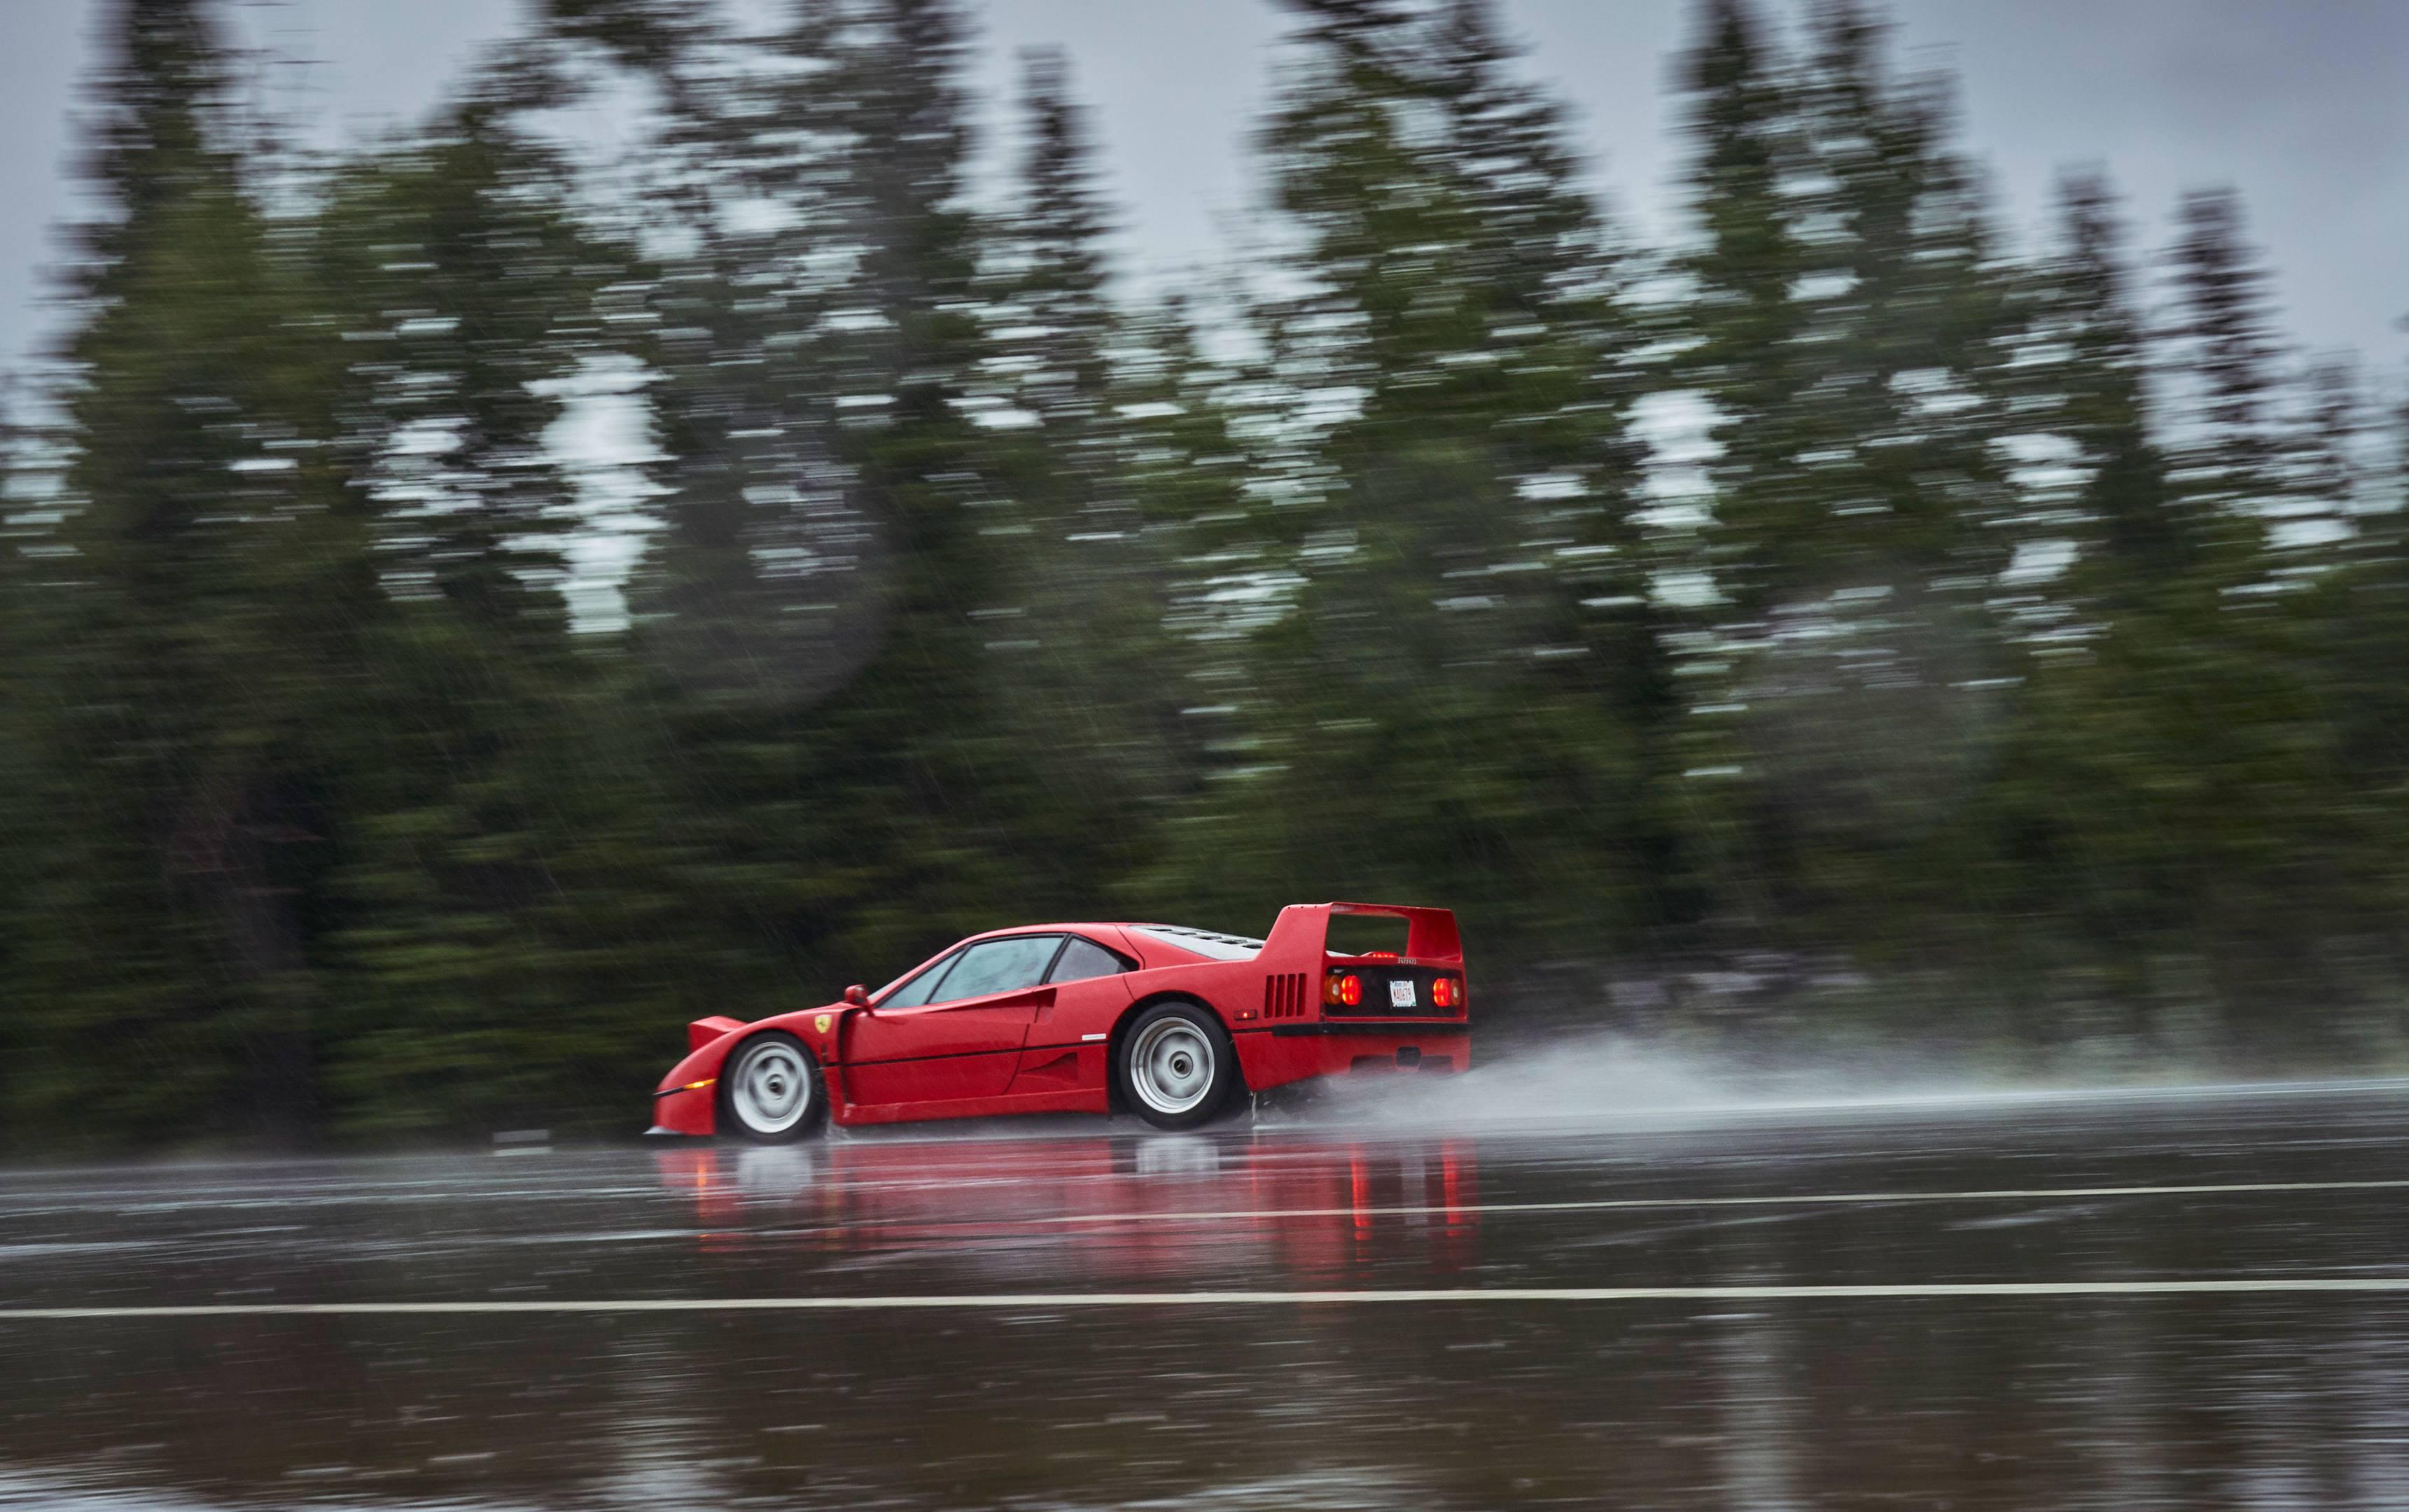 Ferrari F40 driving in the rain